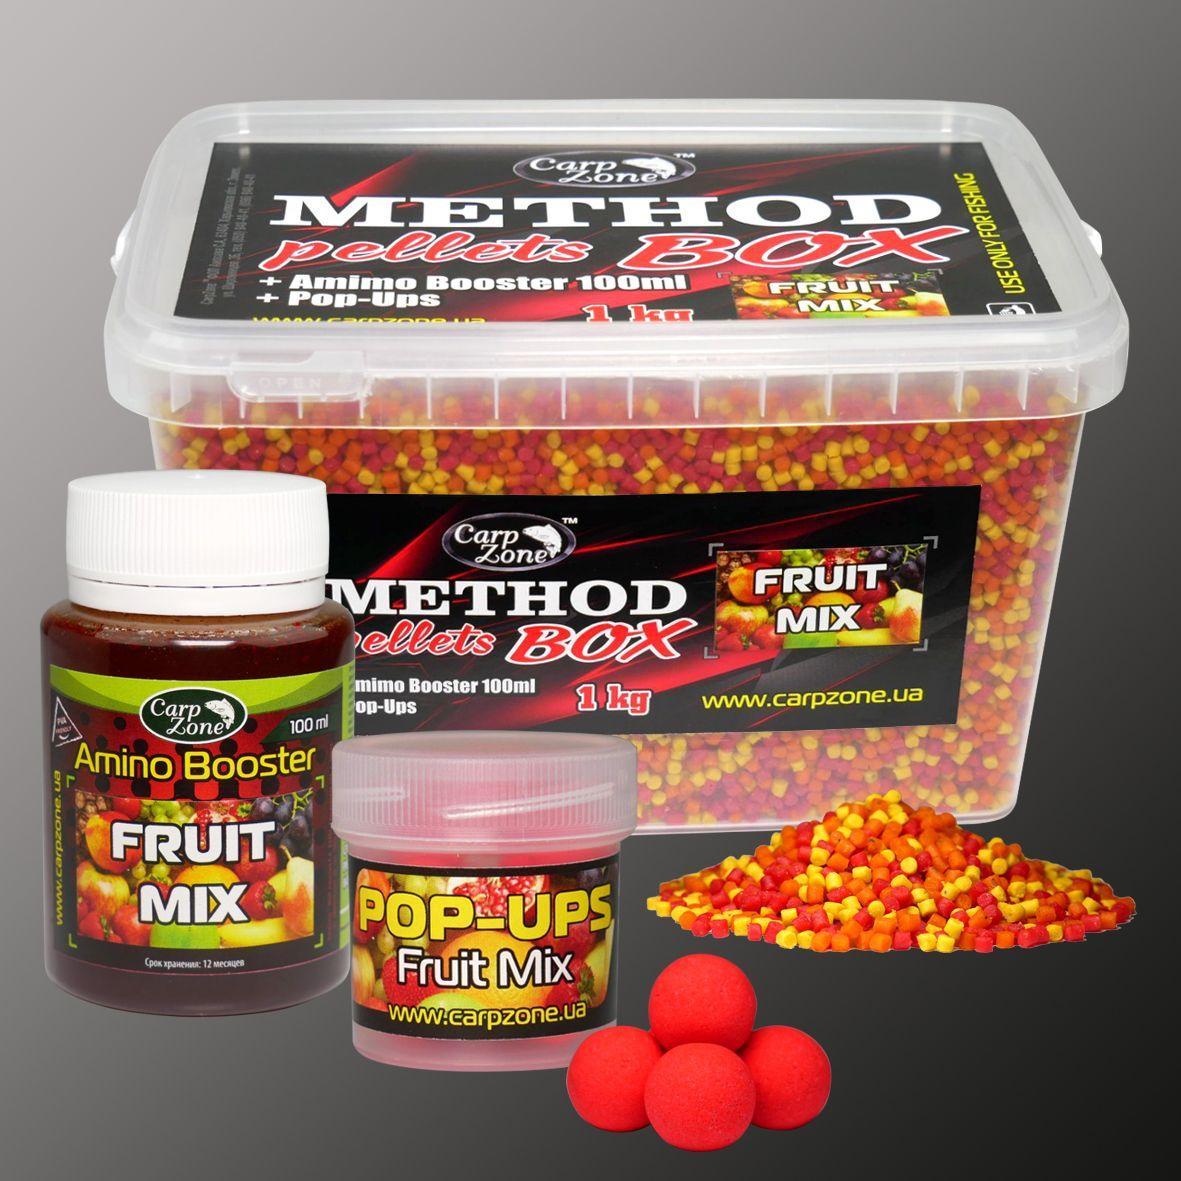 Набір Method Pellets Box Fruit Mix (Фруктовий мікс) 3mm/1kg + Amino Booster 100ml + Pop-Ups 10mm/15pc